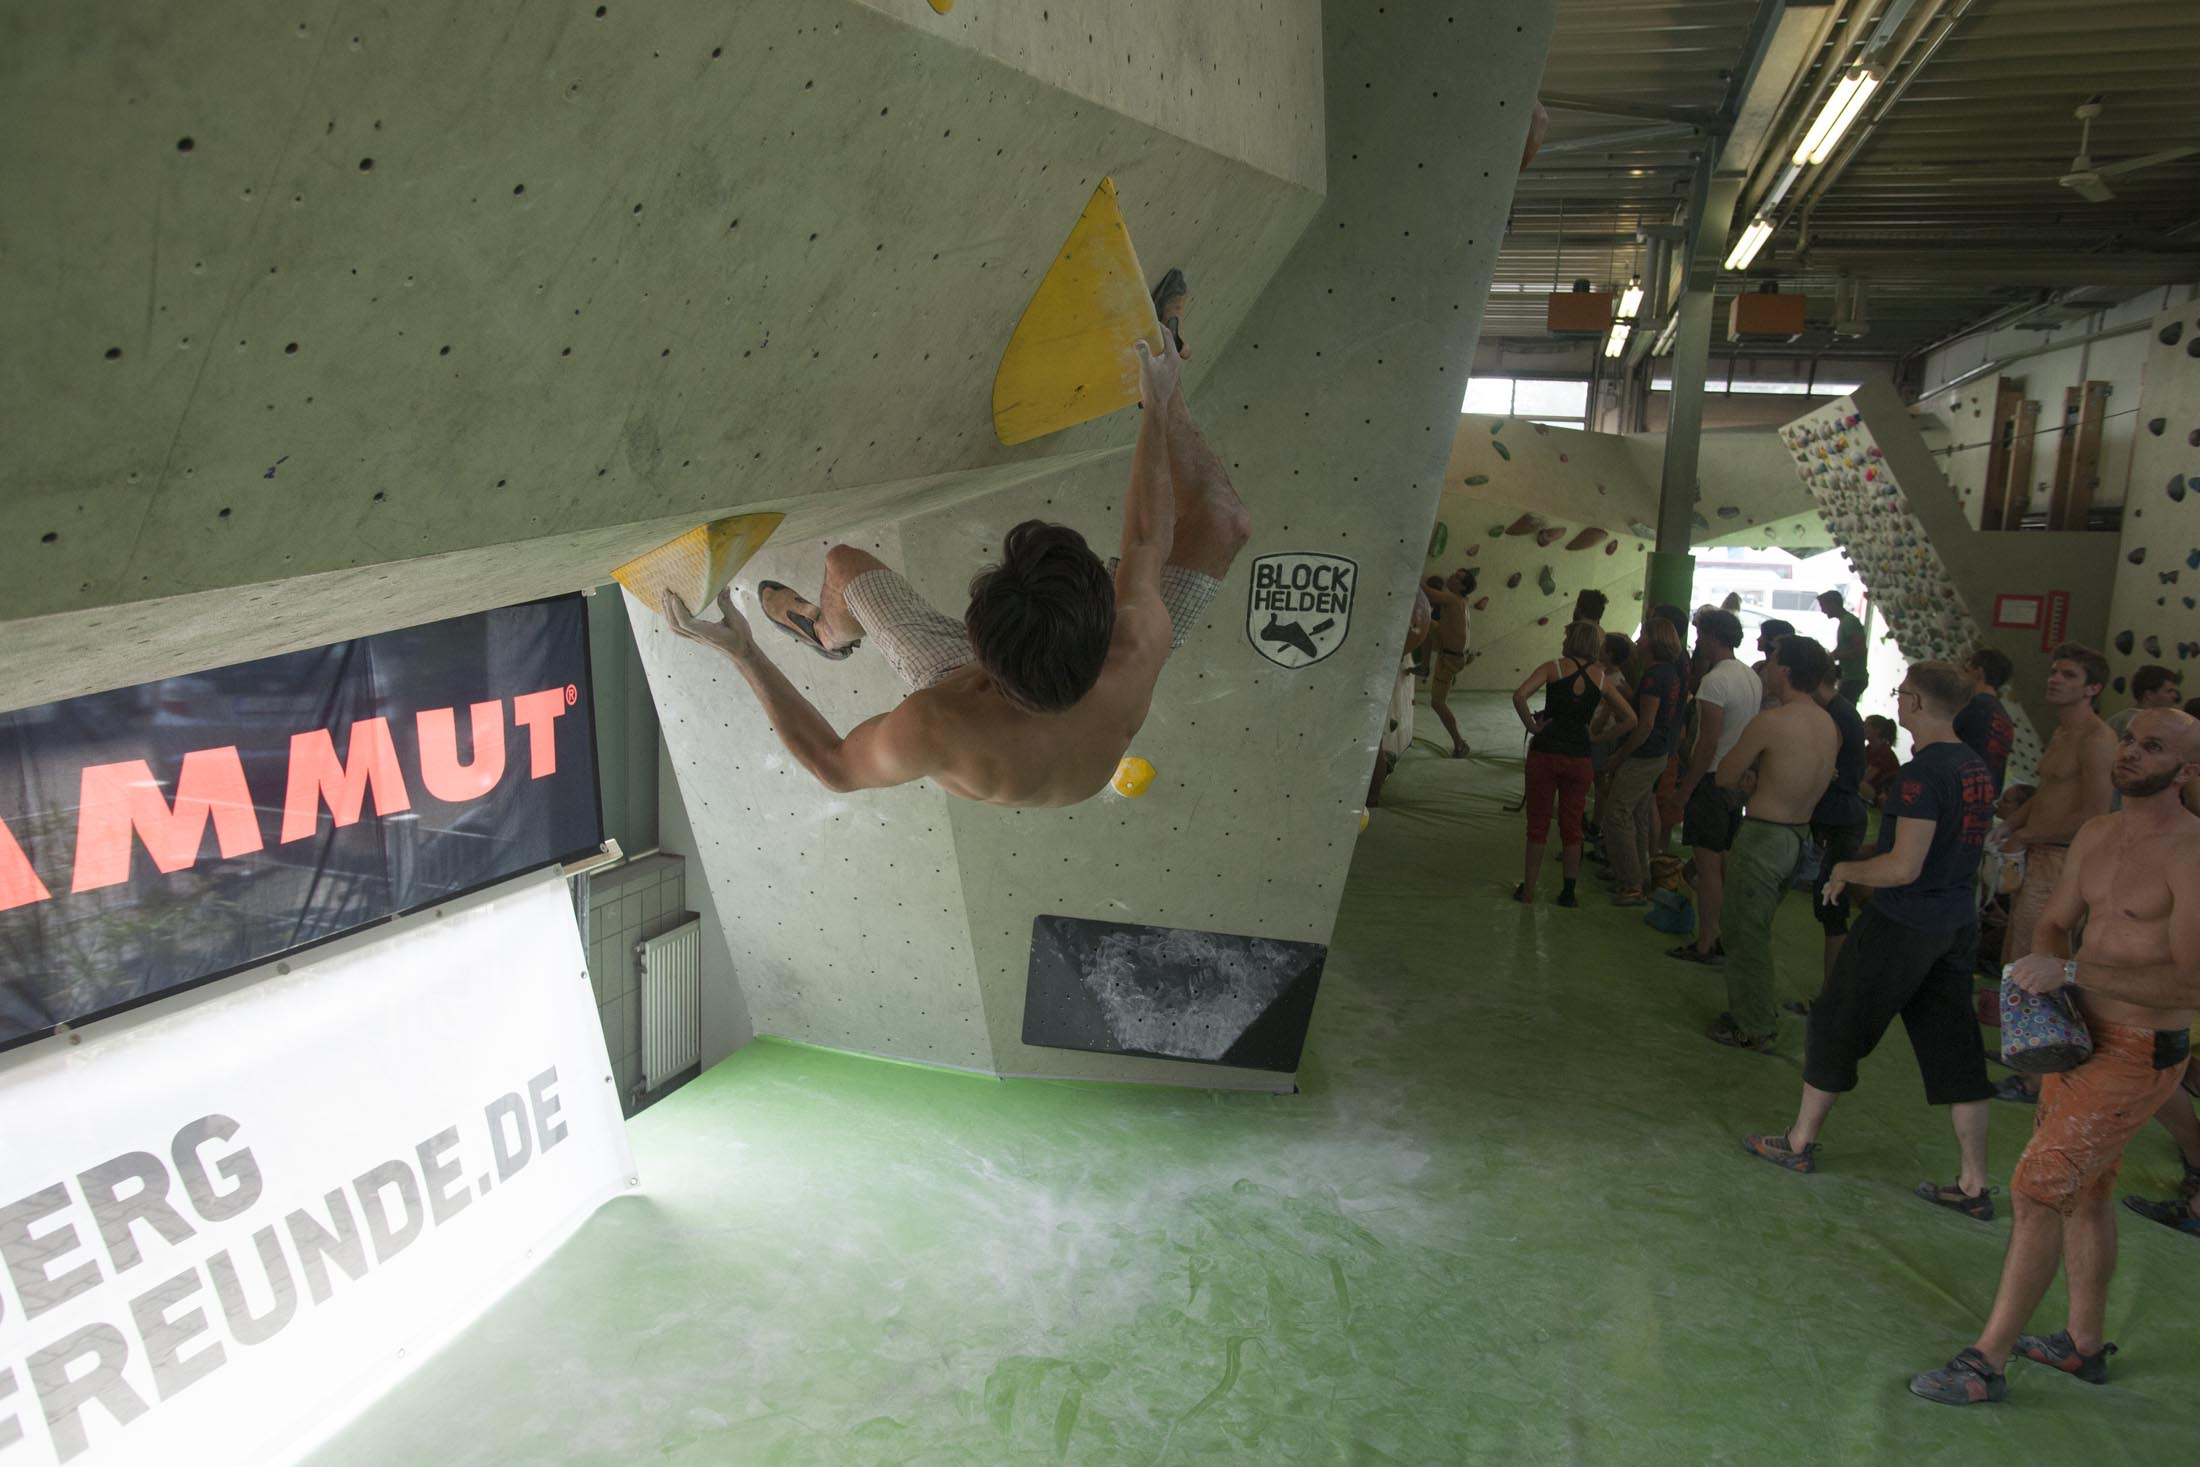 Quali, internationaler bouldercup Frankenjura 2016, BLOCKHELDEN Erlangen, Mammut, Bergfreunde.de, Boulderwettkampf07092016396